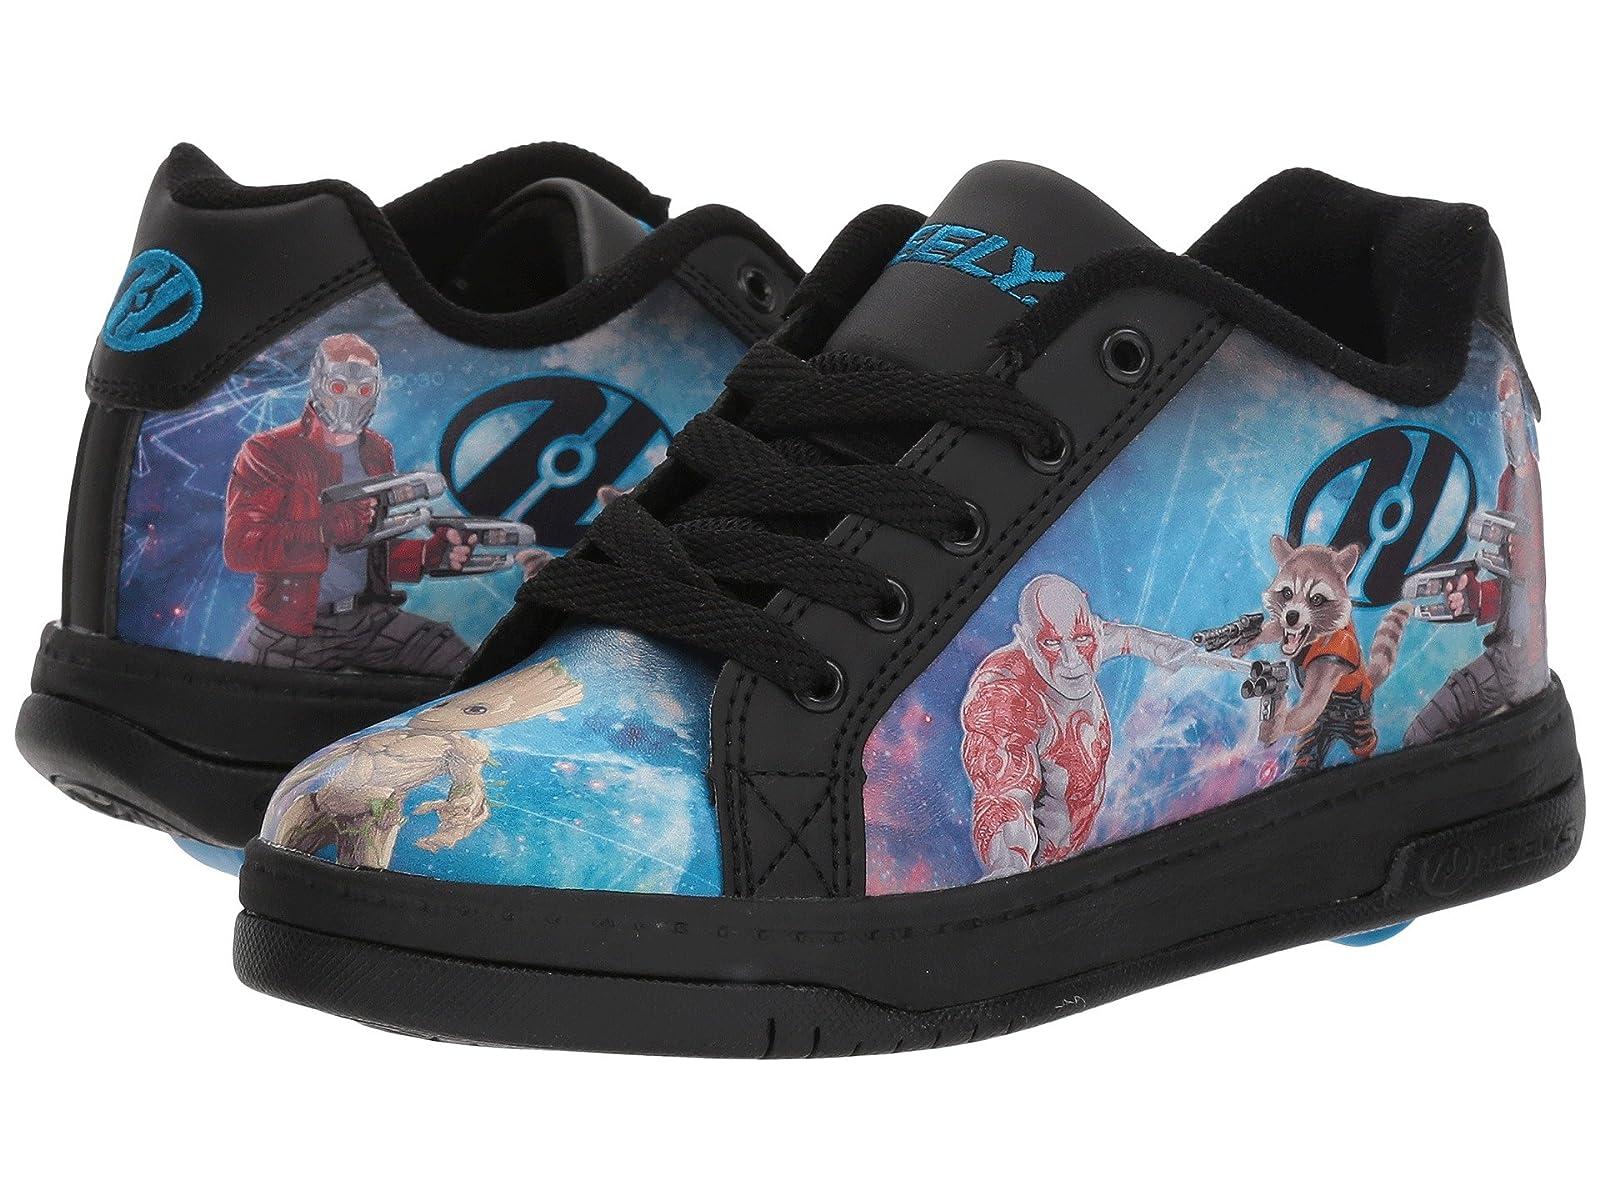 Heelys Split Guardians of Kid/Big the Galaxy (Little Kid/Big of Kid/Adult) 8185d8